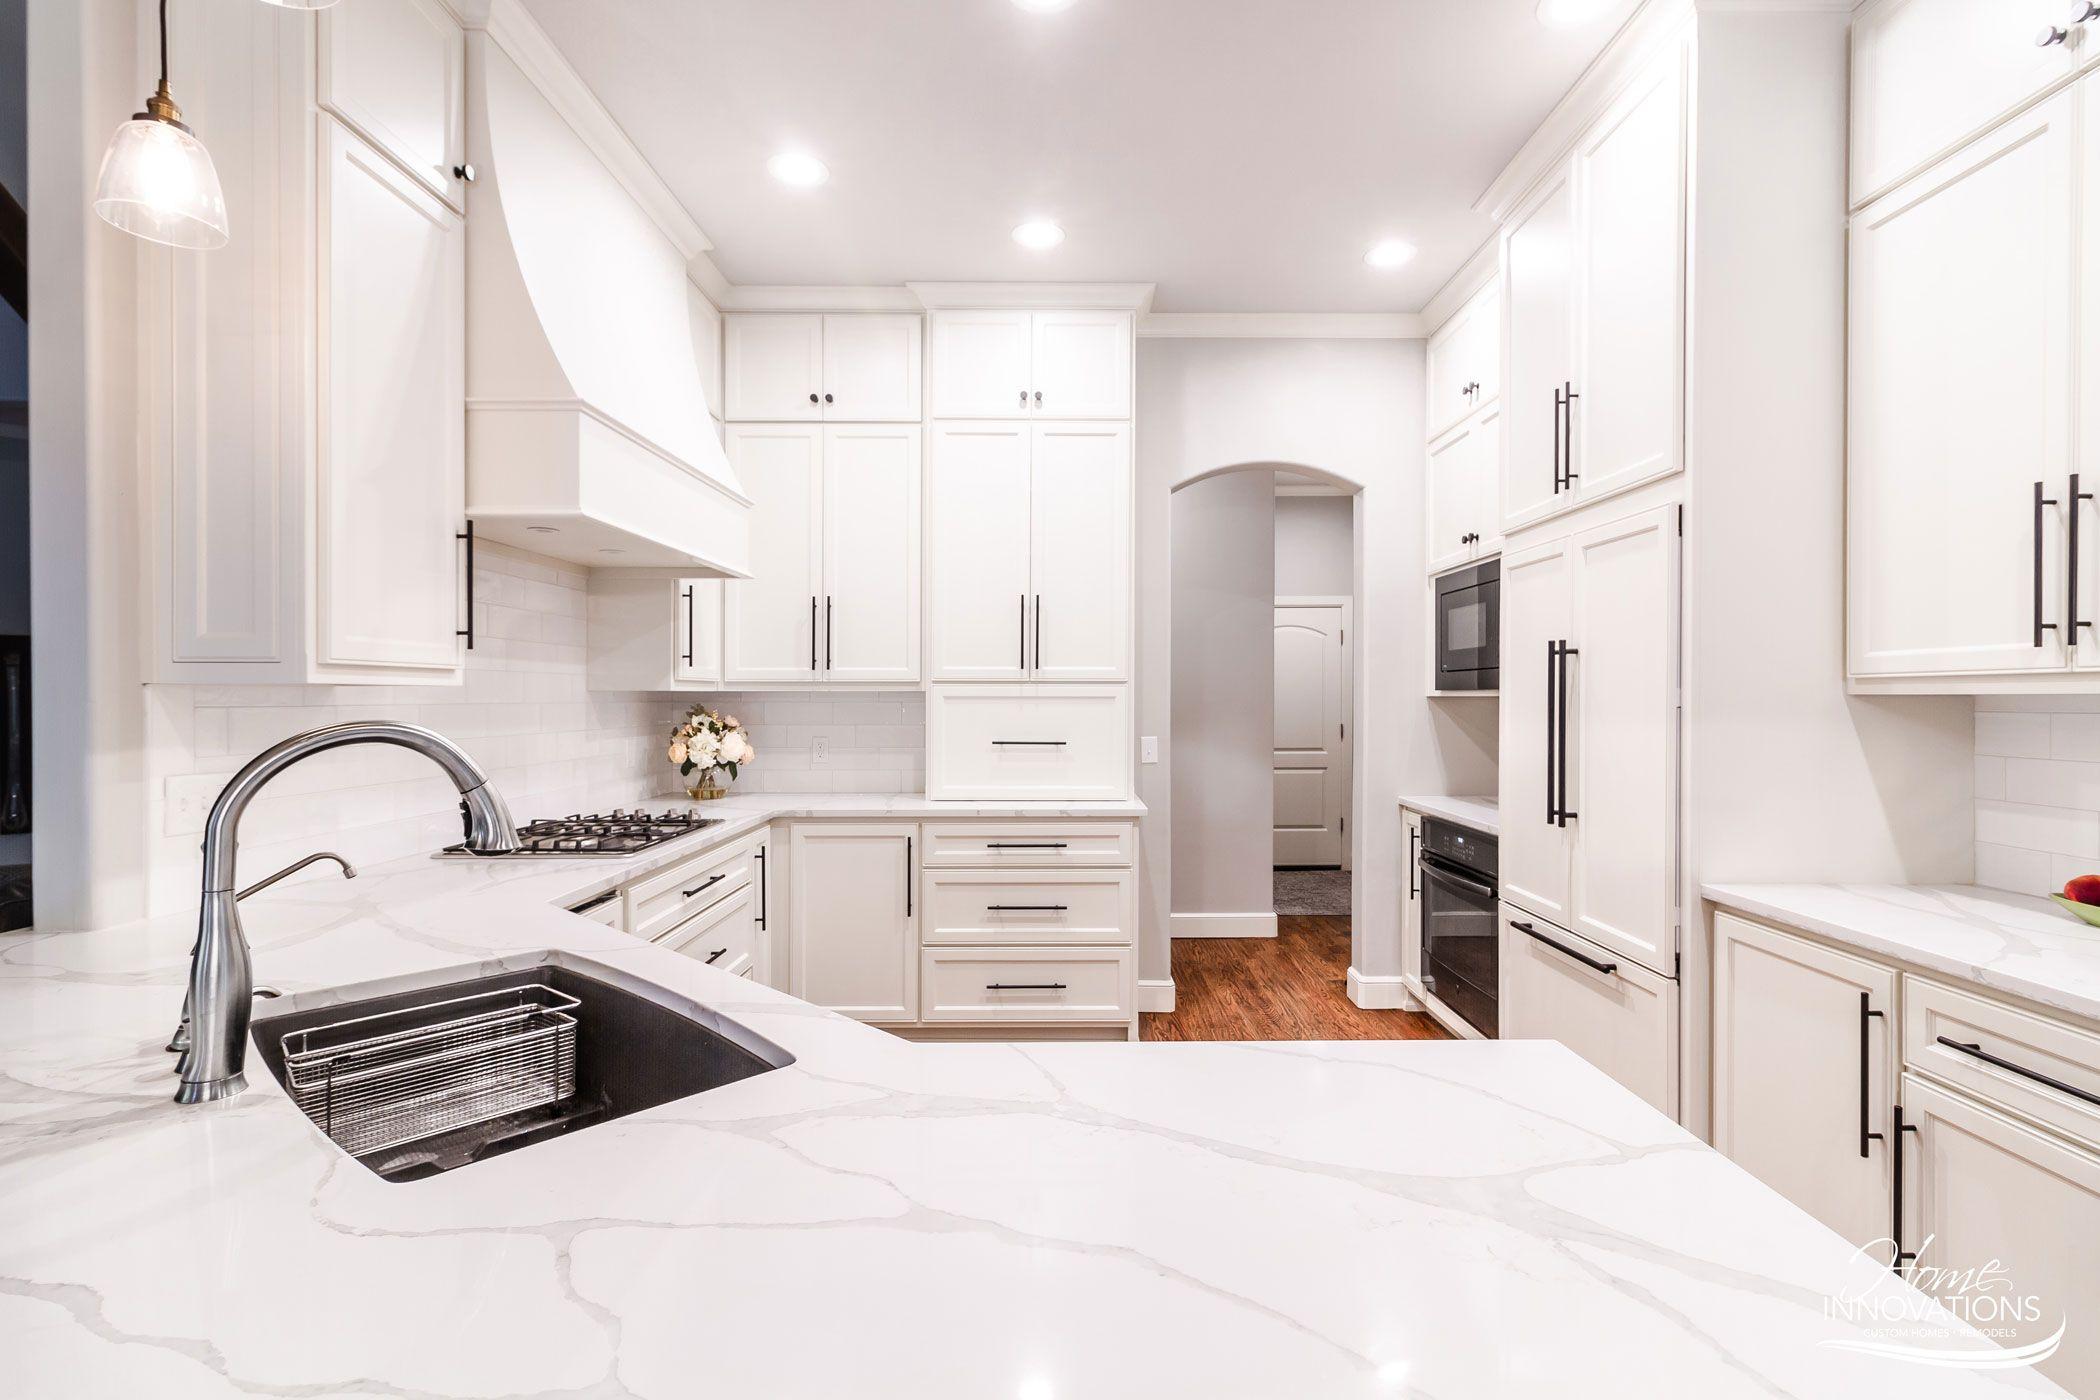 Fantastic Kitchen Cabinet Doors Tulsa Only On Homesable Com Kitchen Cabinets Decor Home Kitchens Kitchen Design